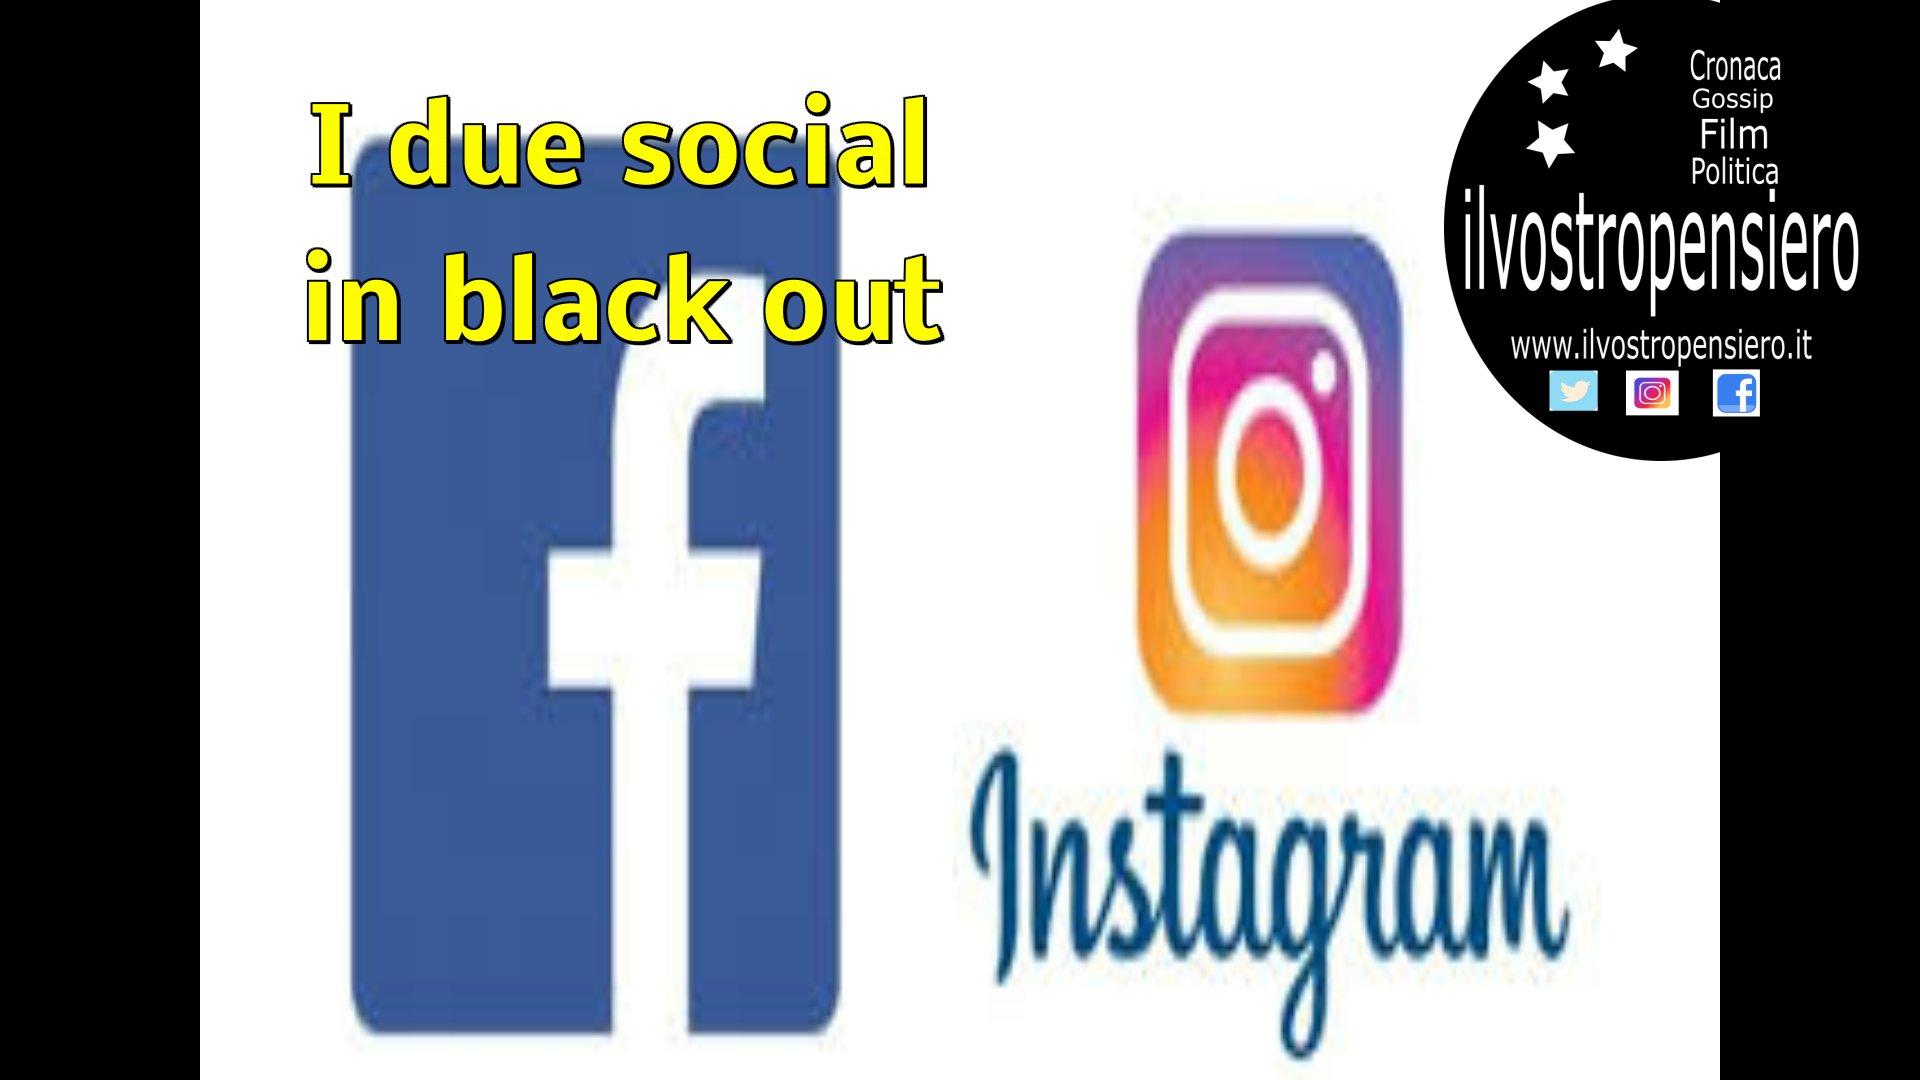 Social: Instagram e Facebook in black out!